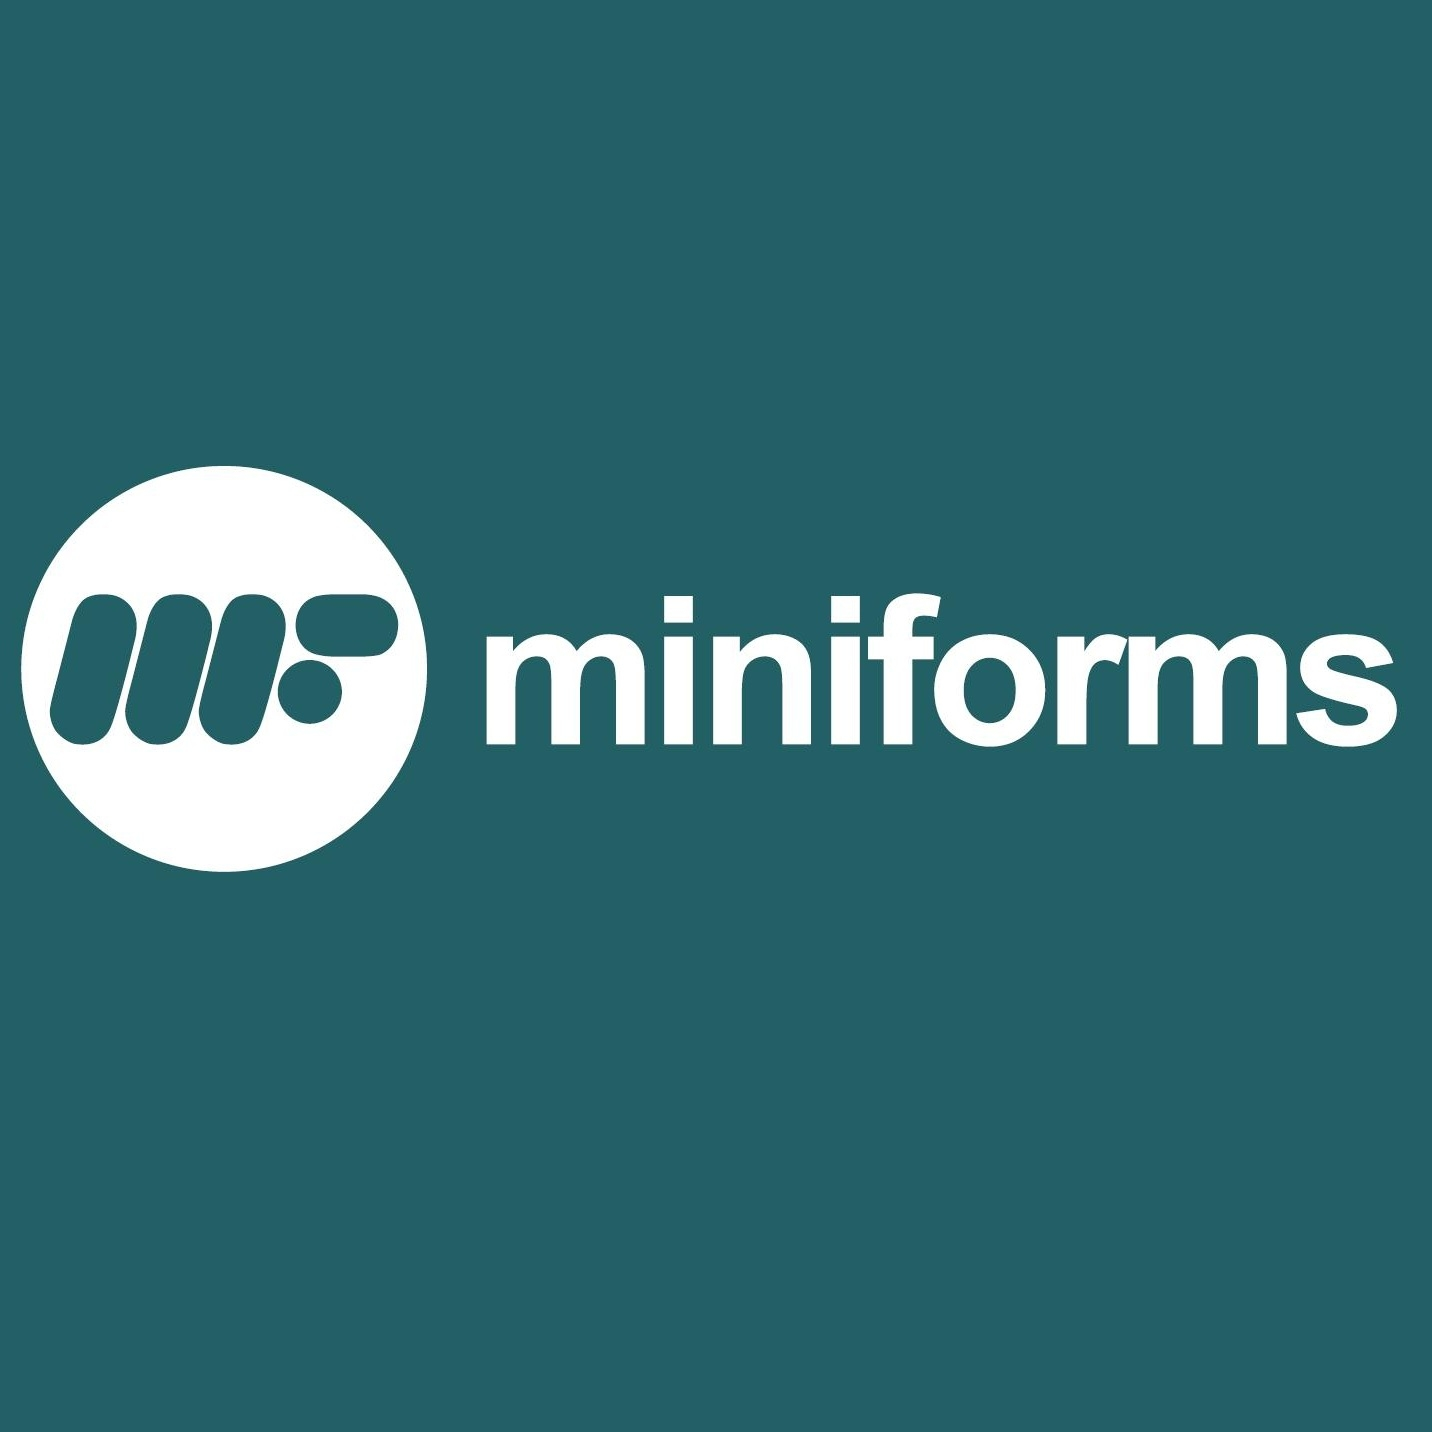 Miniforms (MF)